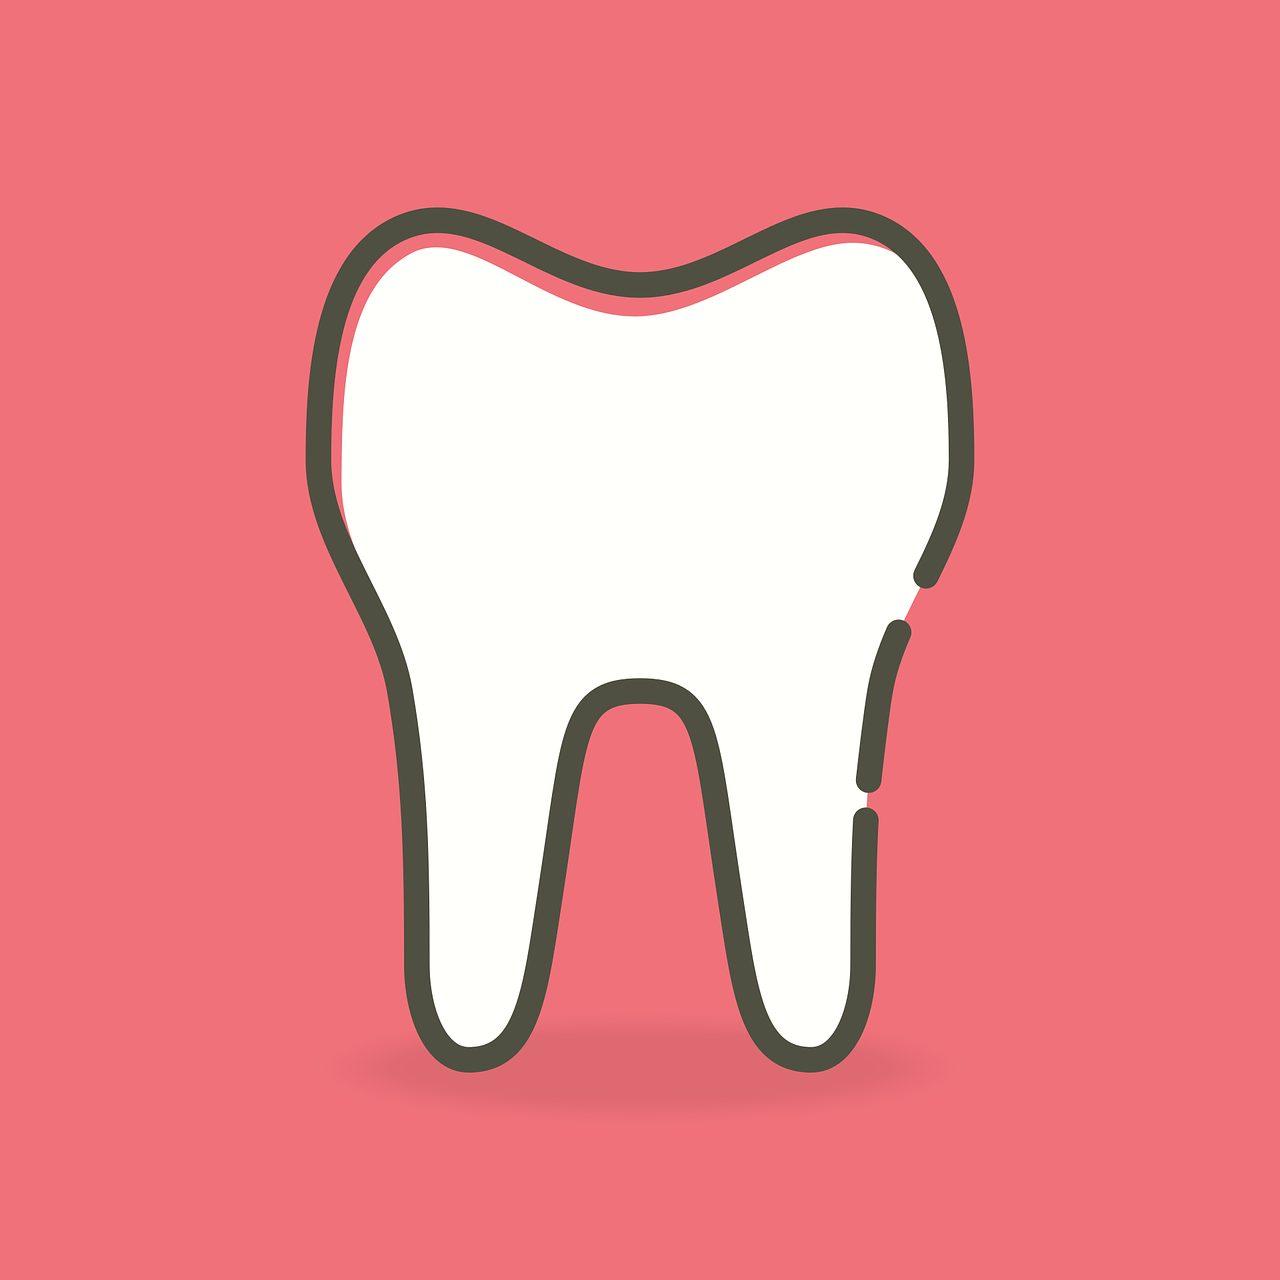 Zand Tandarts G H M vd spoed tandarts